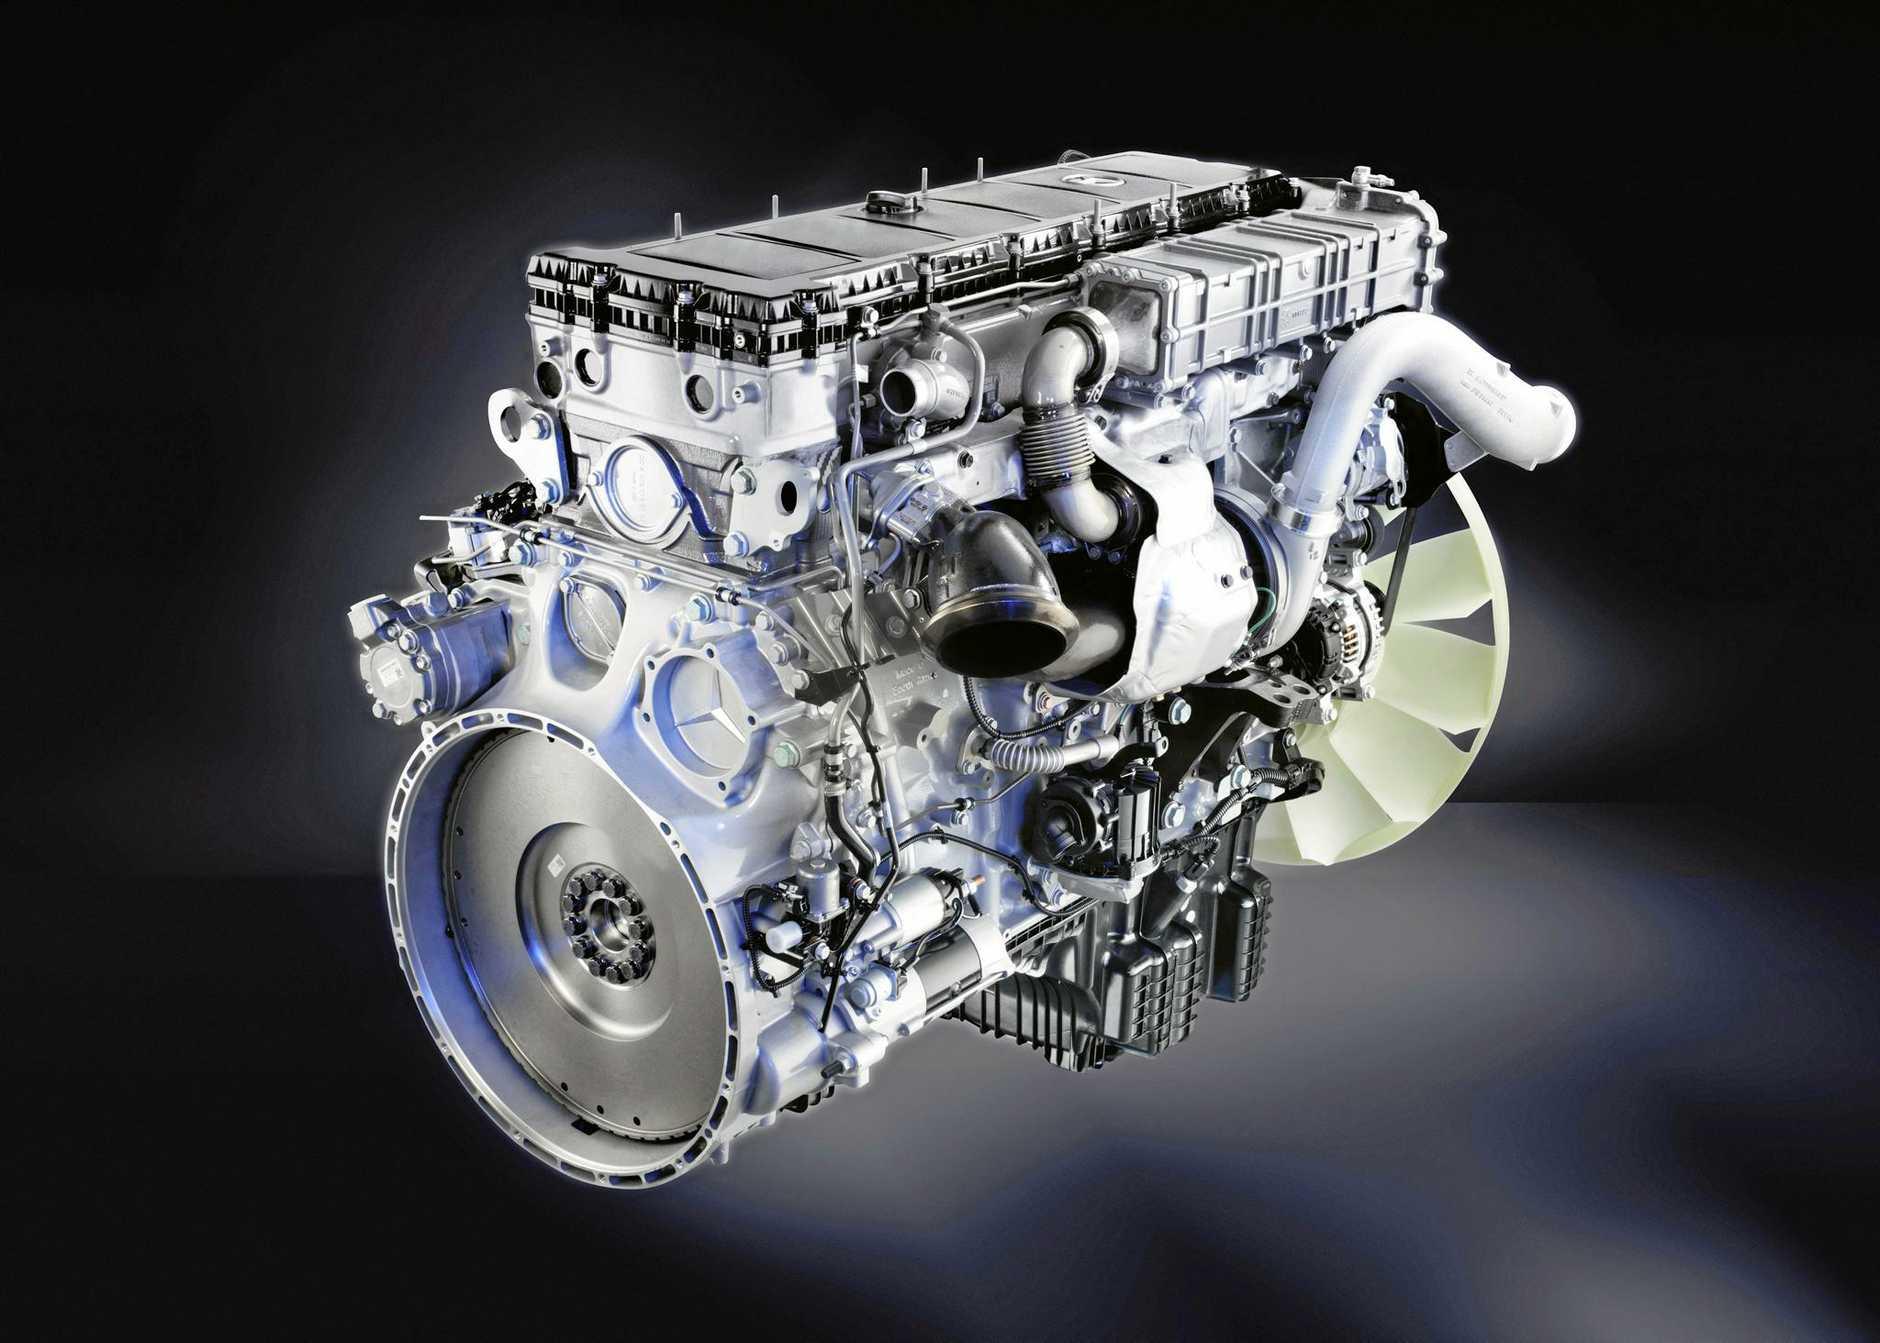 The 16-litre OM 471 engine.